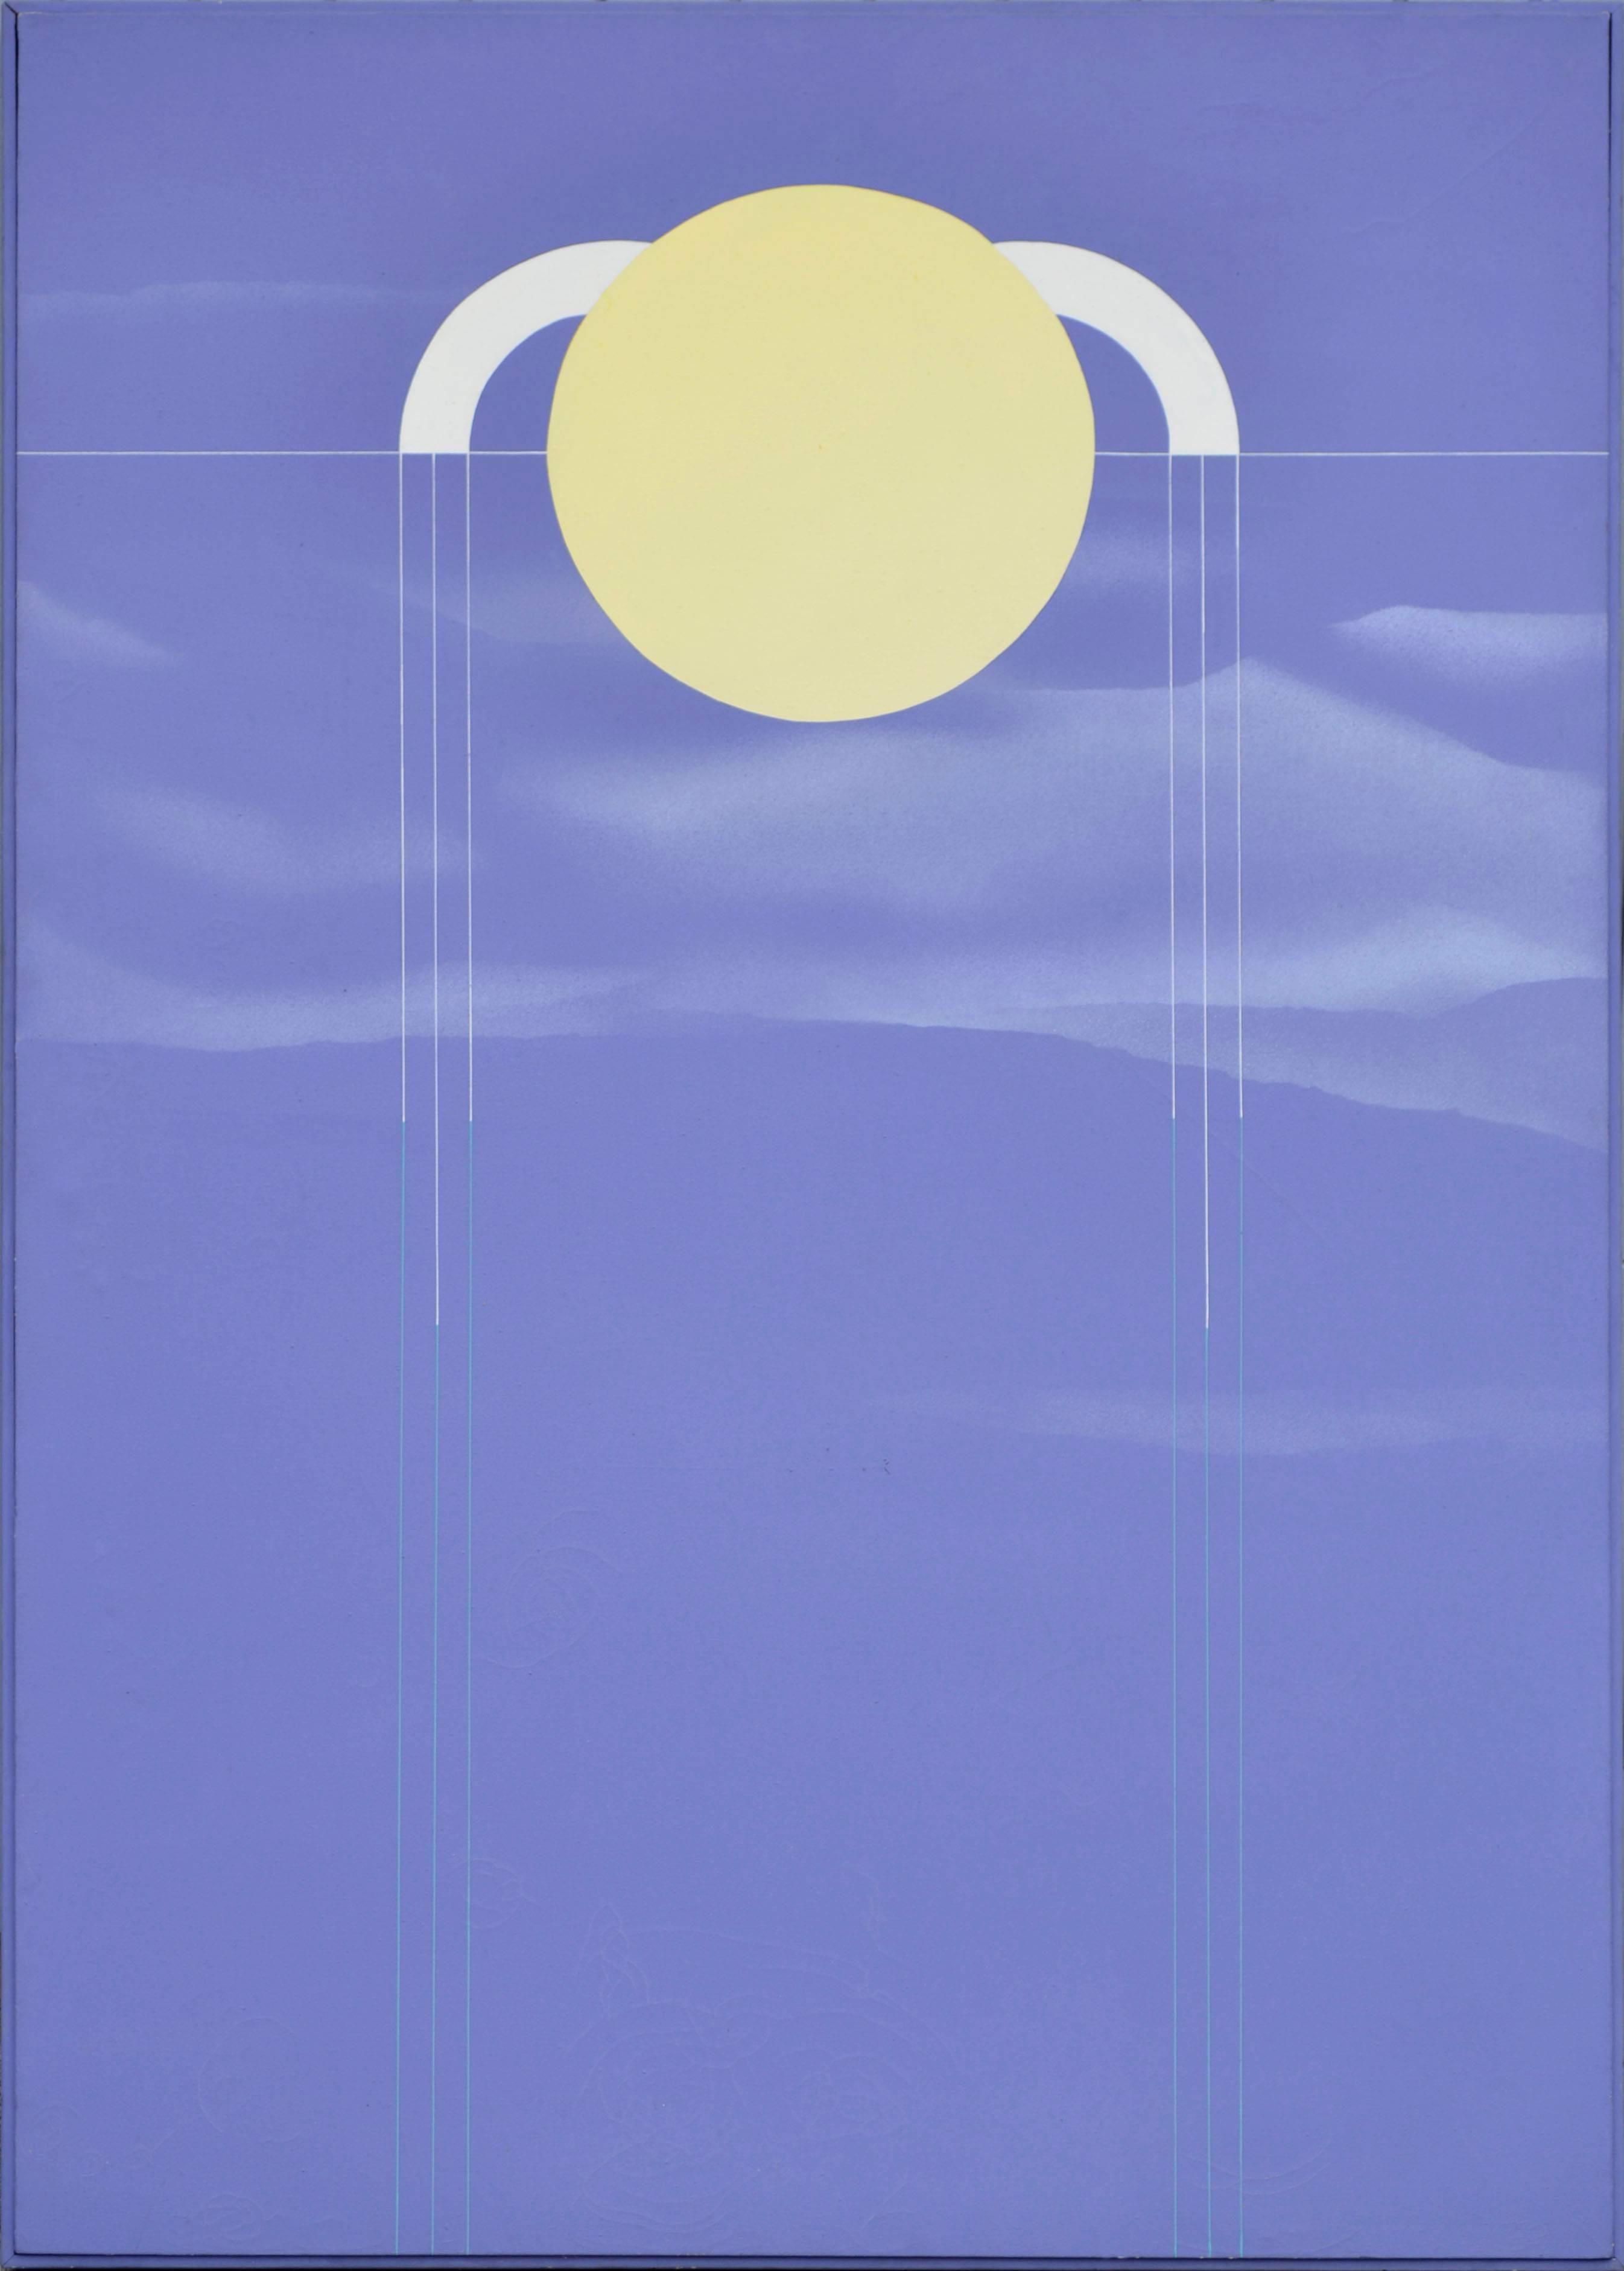 Zuni Moon - 1970's Minimalist Geometric Abstract